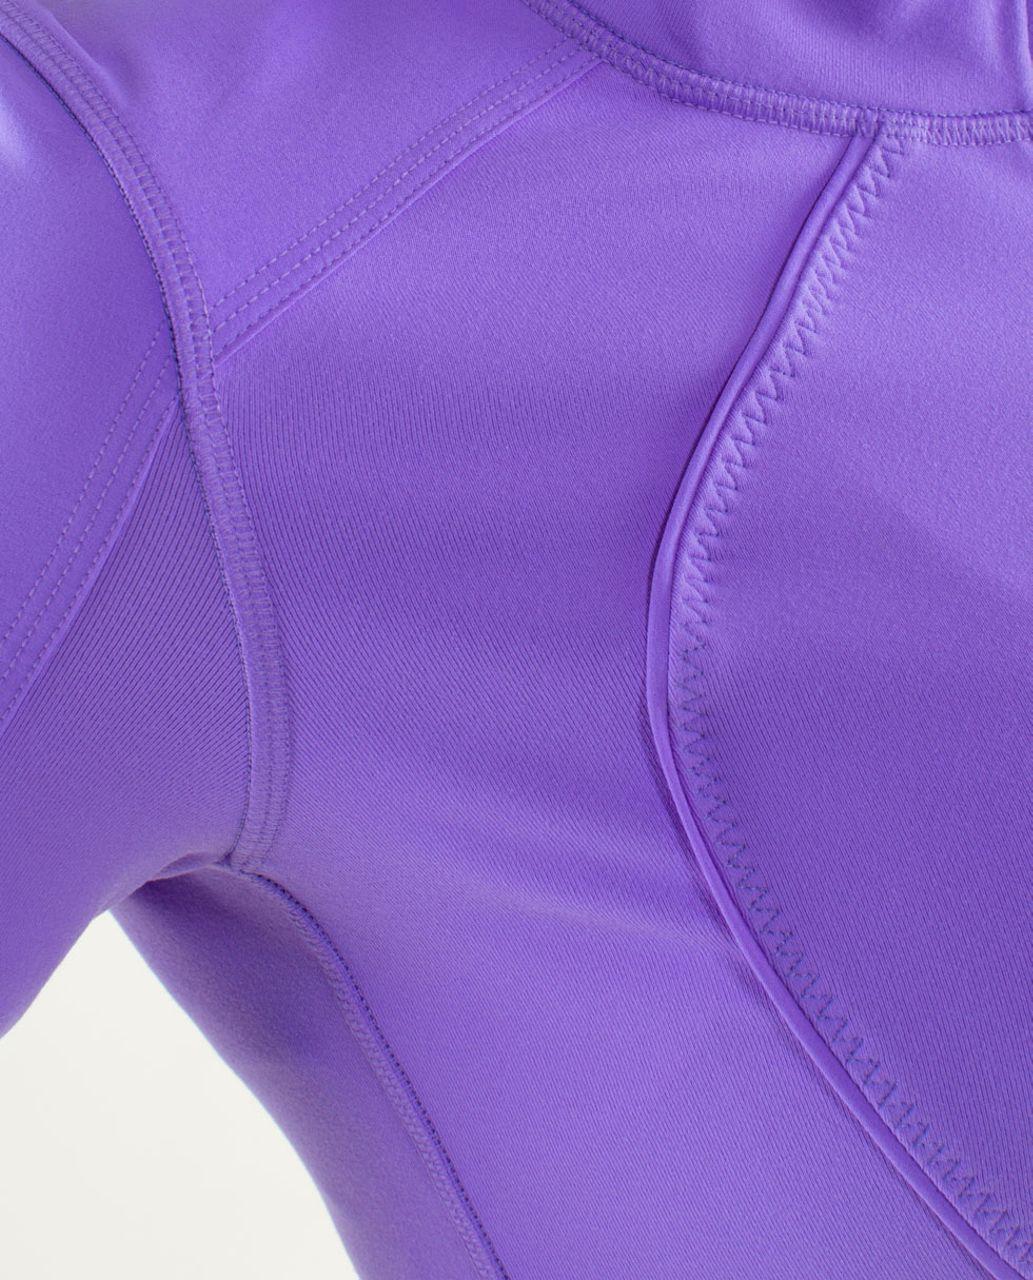 Lululemon Contempo Jacket - Power Purple